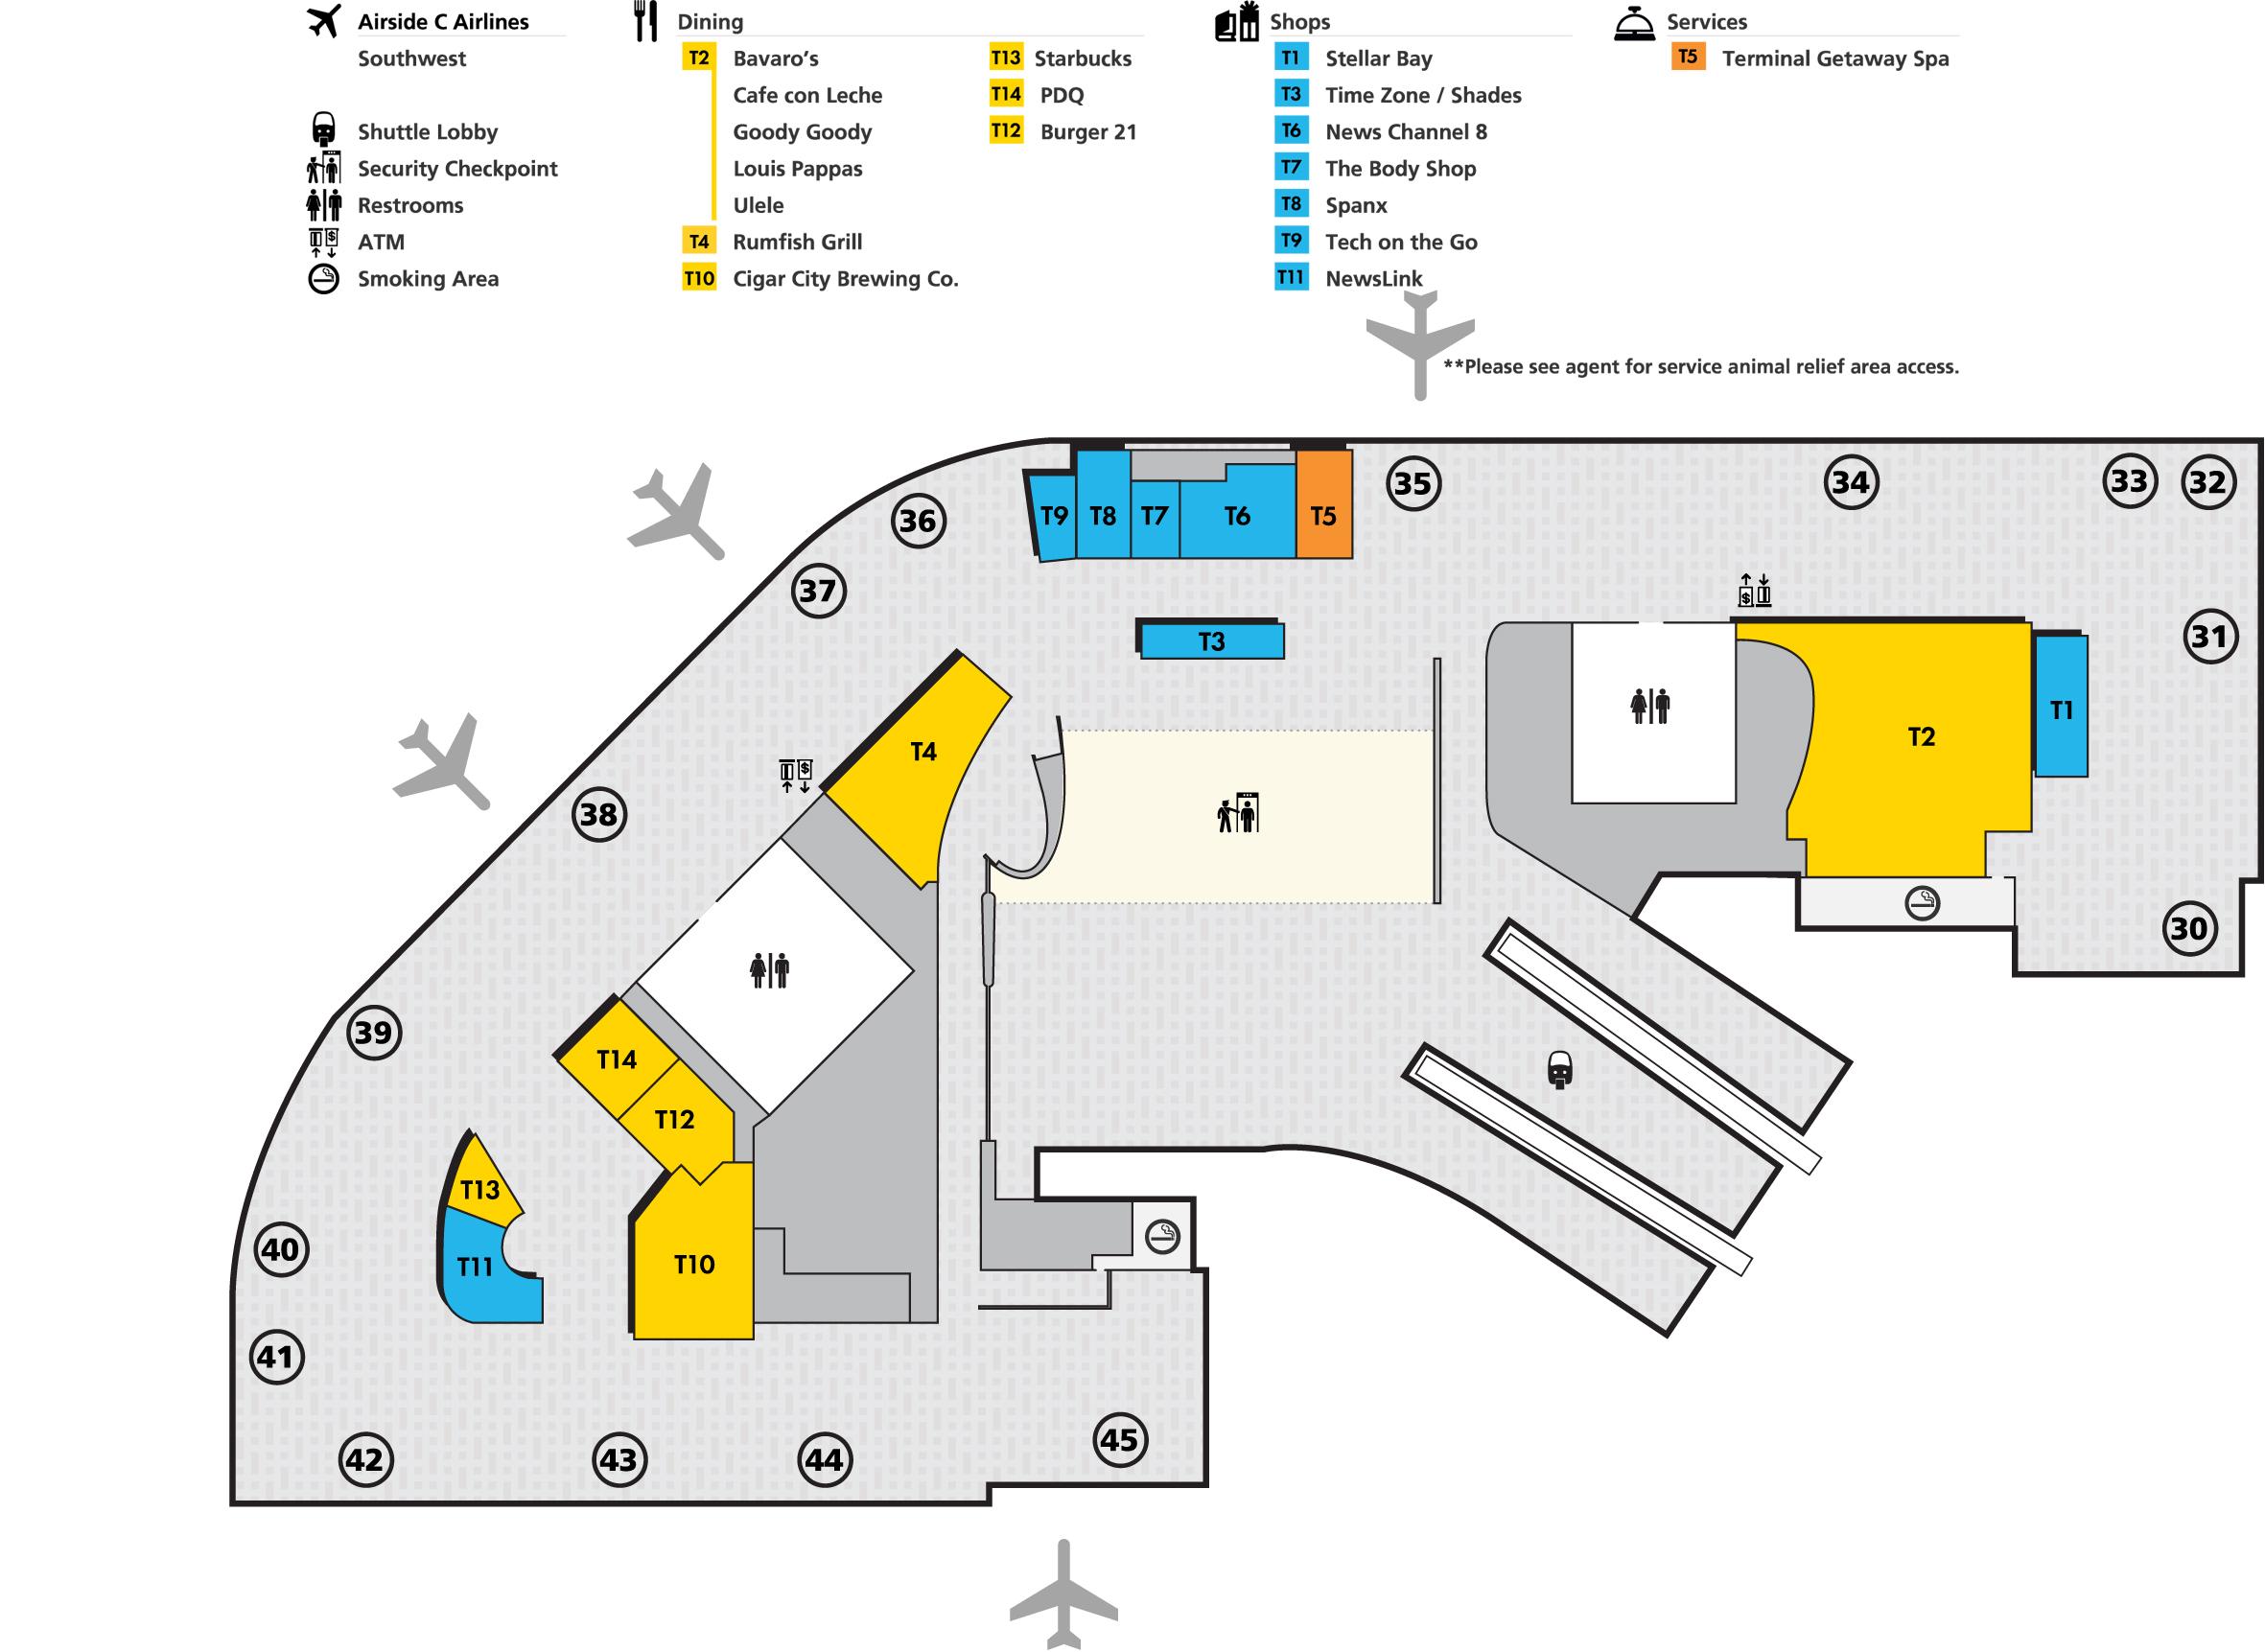 tampa airport map (tpa) - printable terminal maps, shops